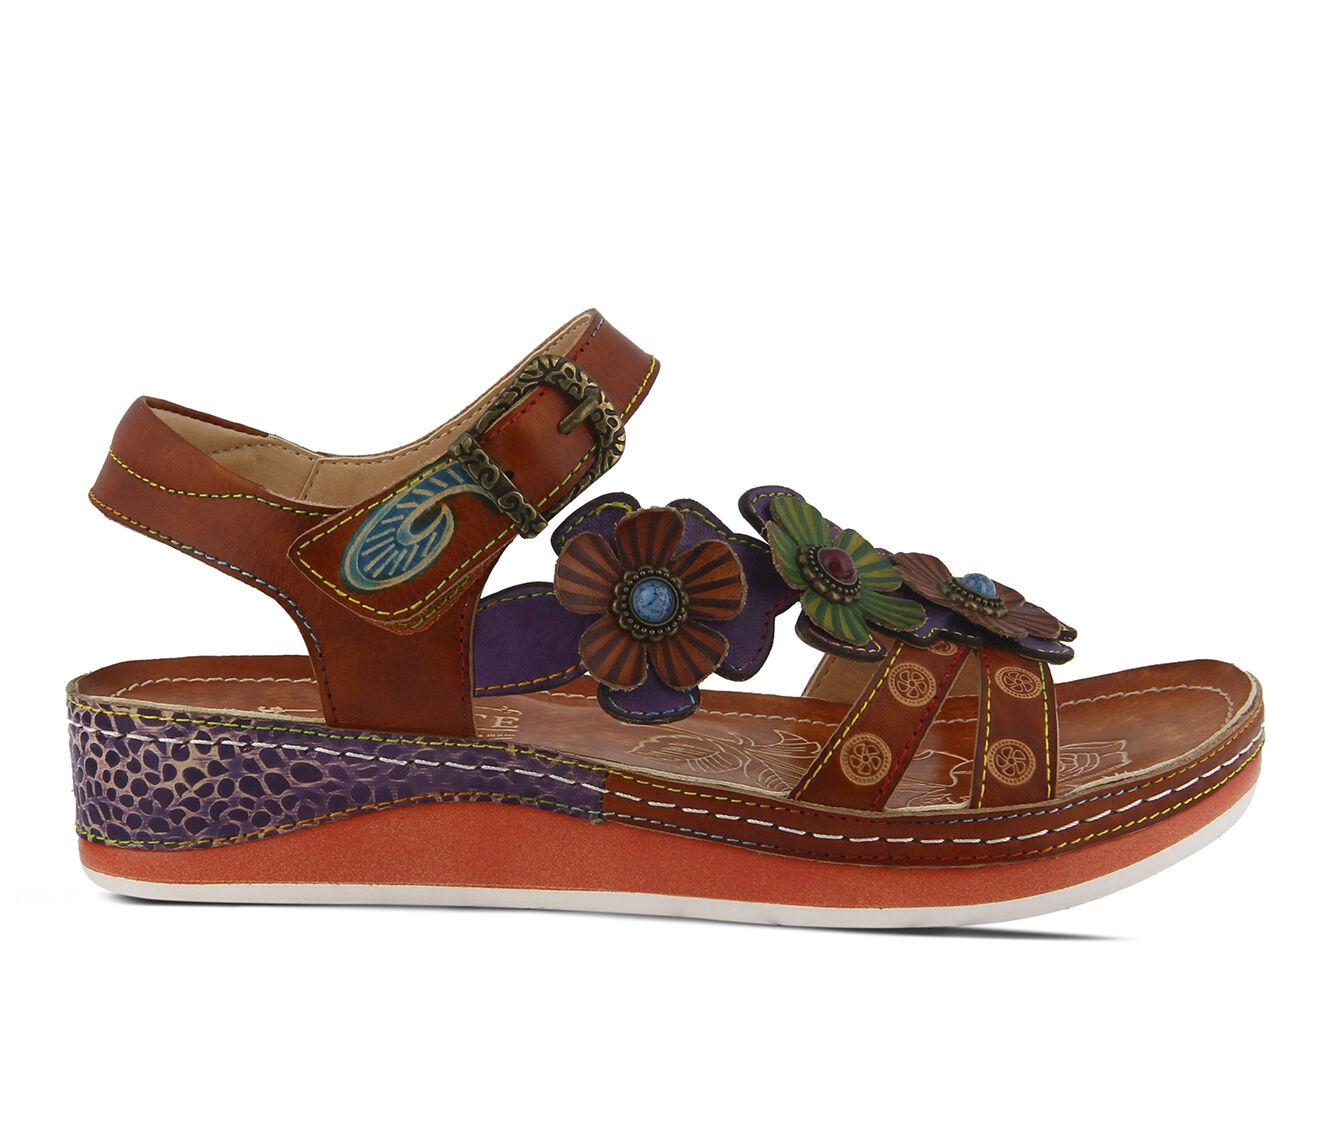 Women's L'ARTISTE Goodie Sandals Camel